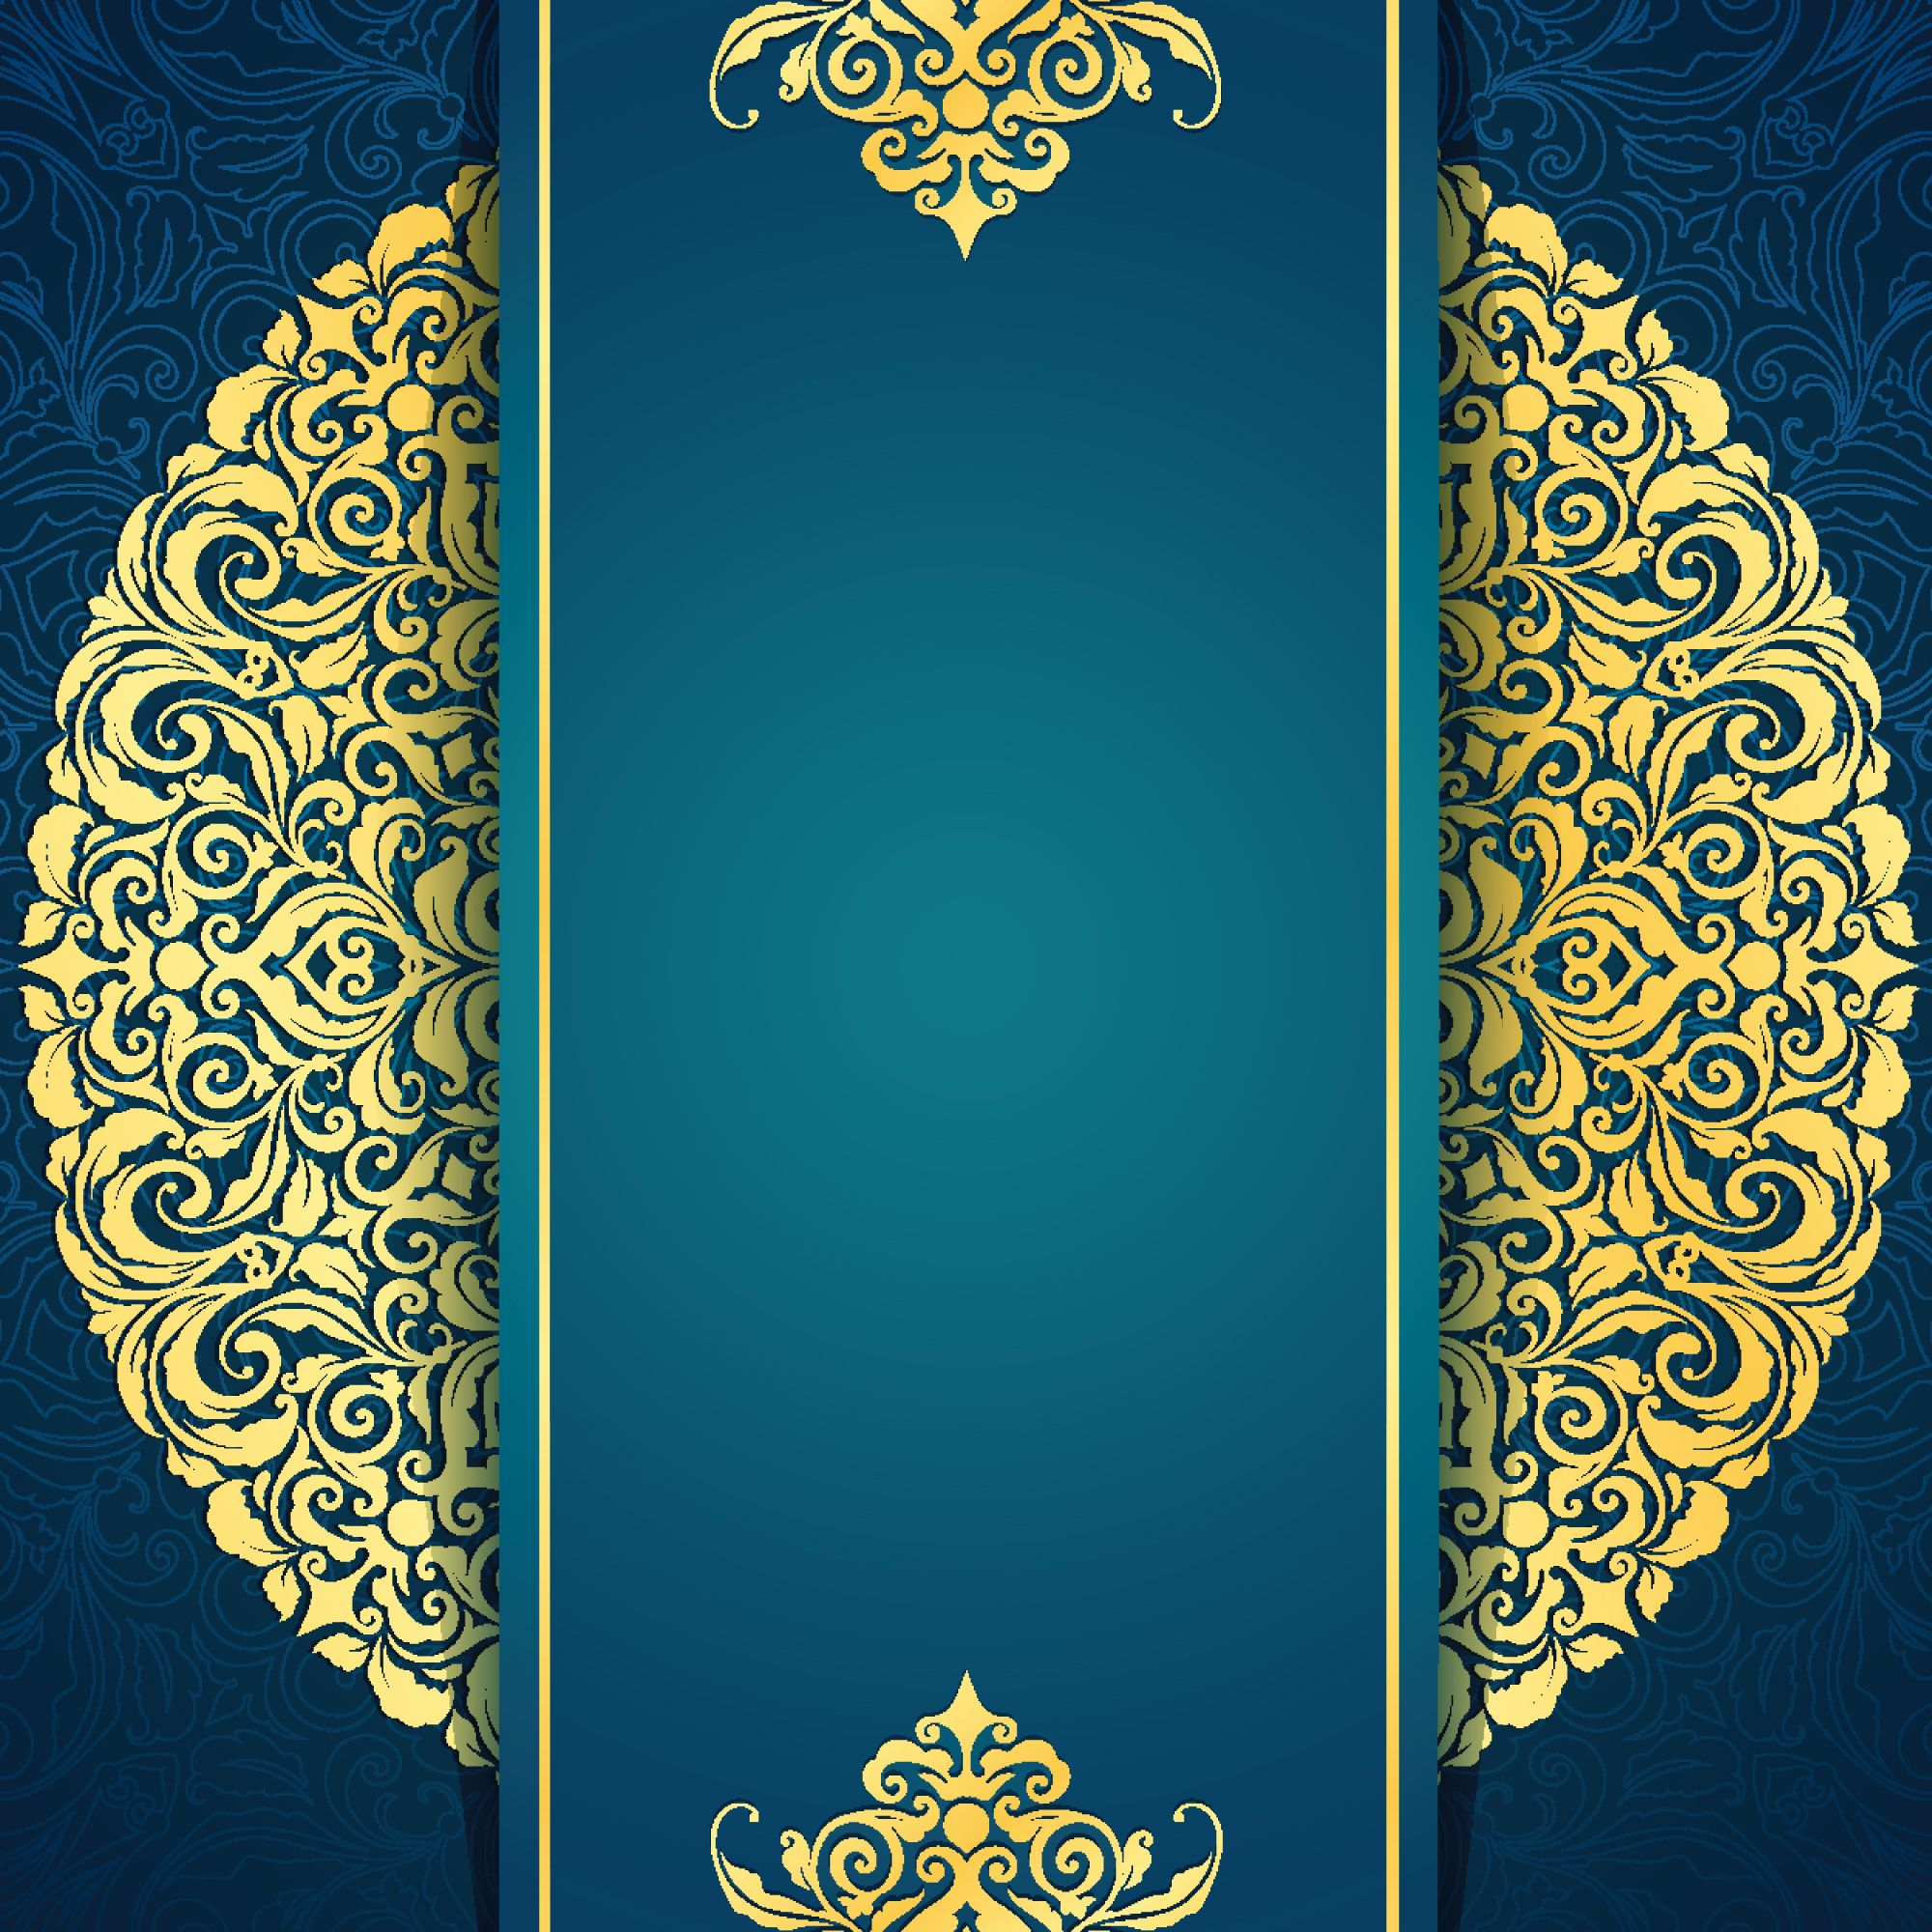 14 Elegant Invitation Card Background Images Images Invitation Background Wedding Invitation Background Wedding Background Images